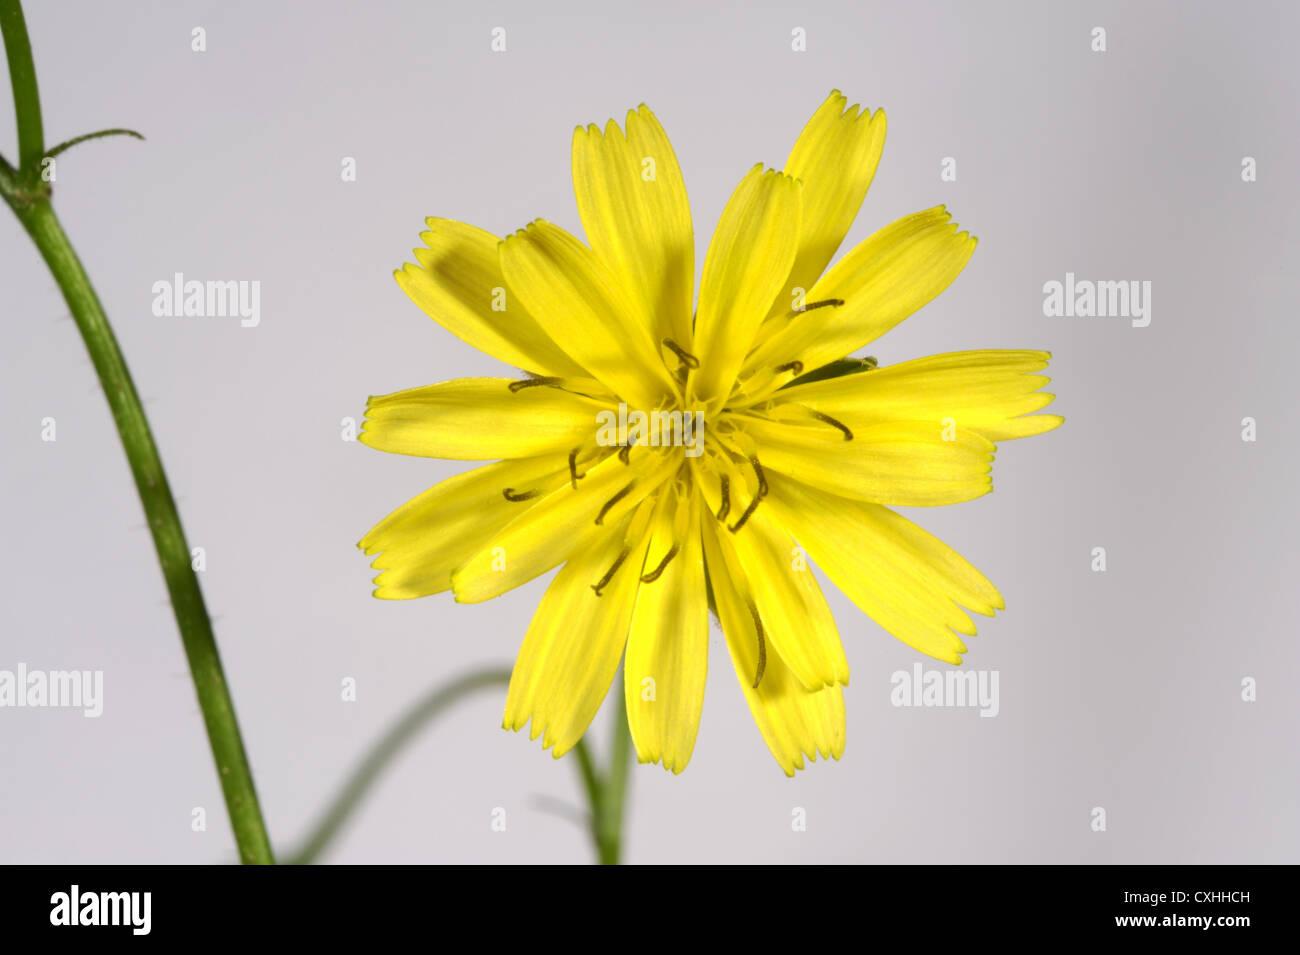 Nipplewort Lapsana communis flower - Stock Image